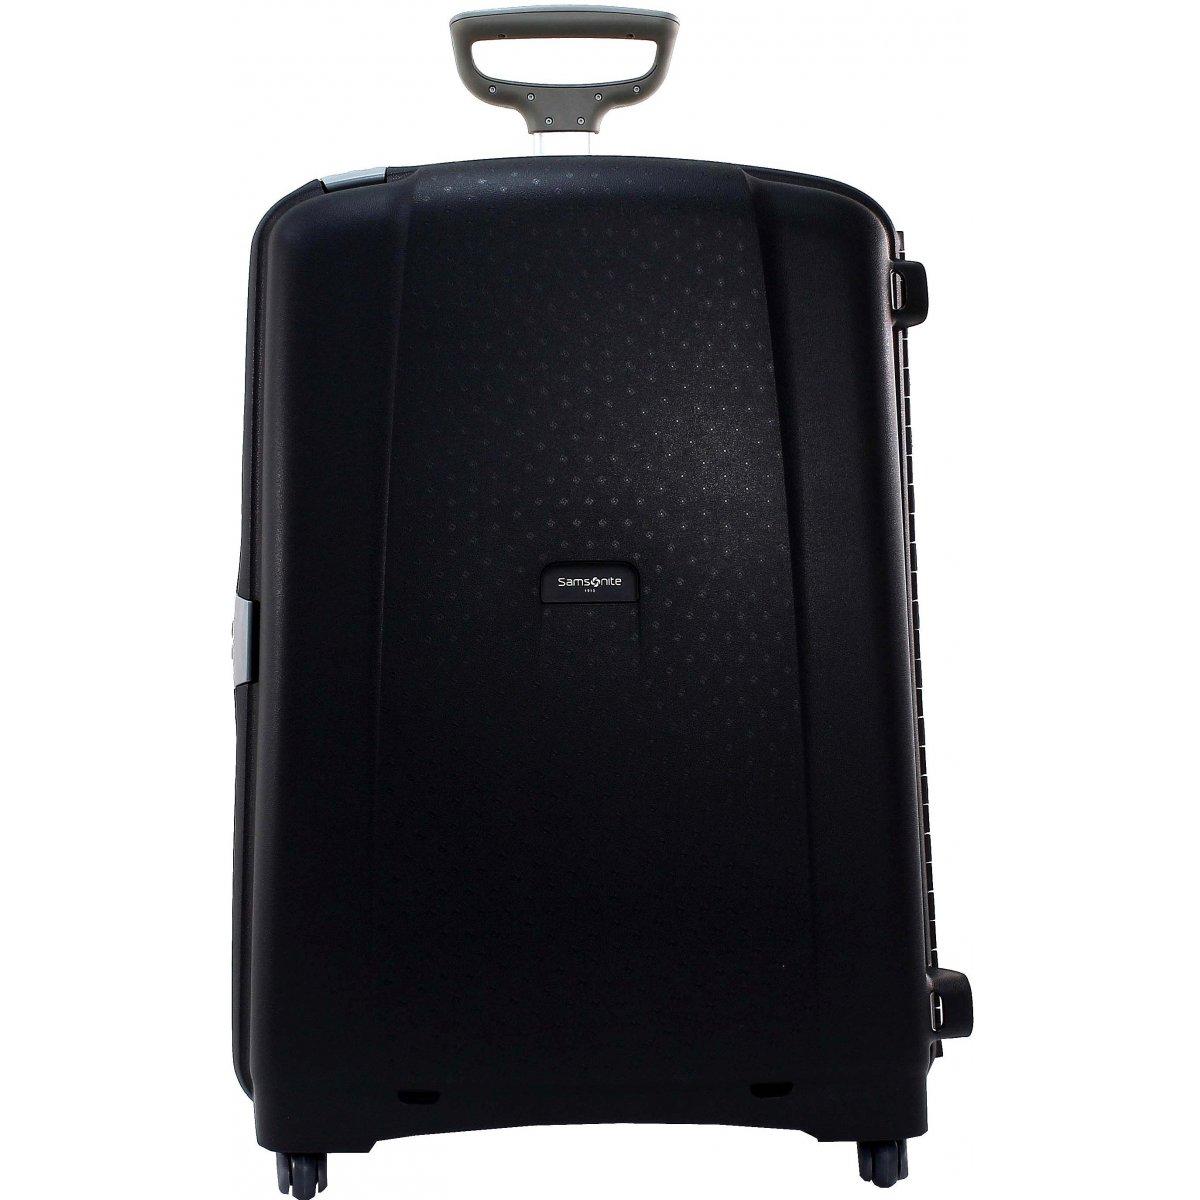 valise samsonite aeris spinner 75cm aeris36 couleur principale noir solde. Black Bedroom Furniture Sets. Home Design Ideas